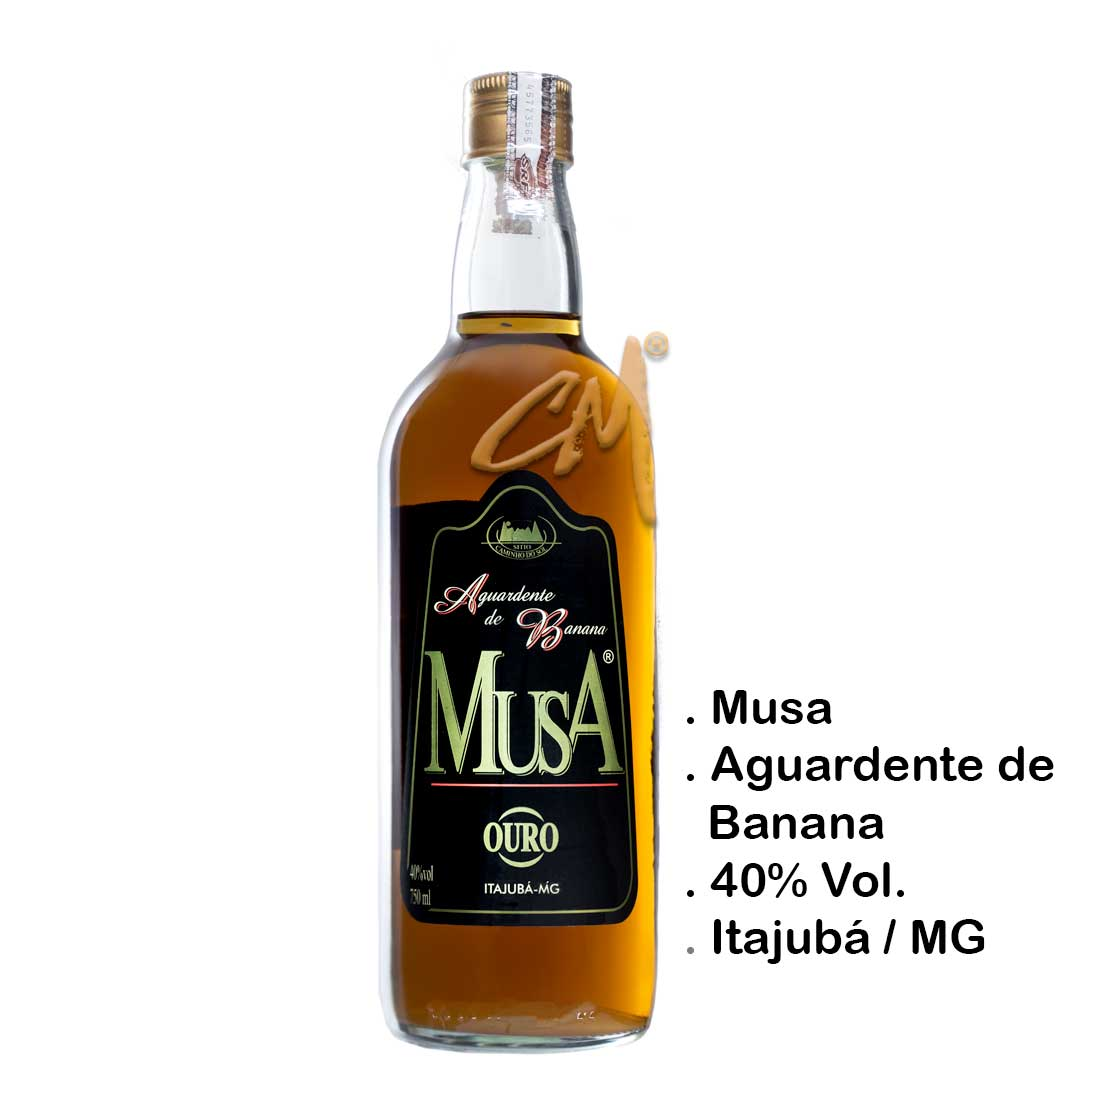 Aguardente de Banana Musa Ouro 750 ml (Itajubá - MG)